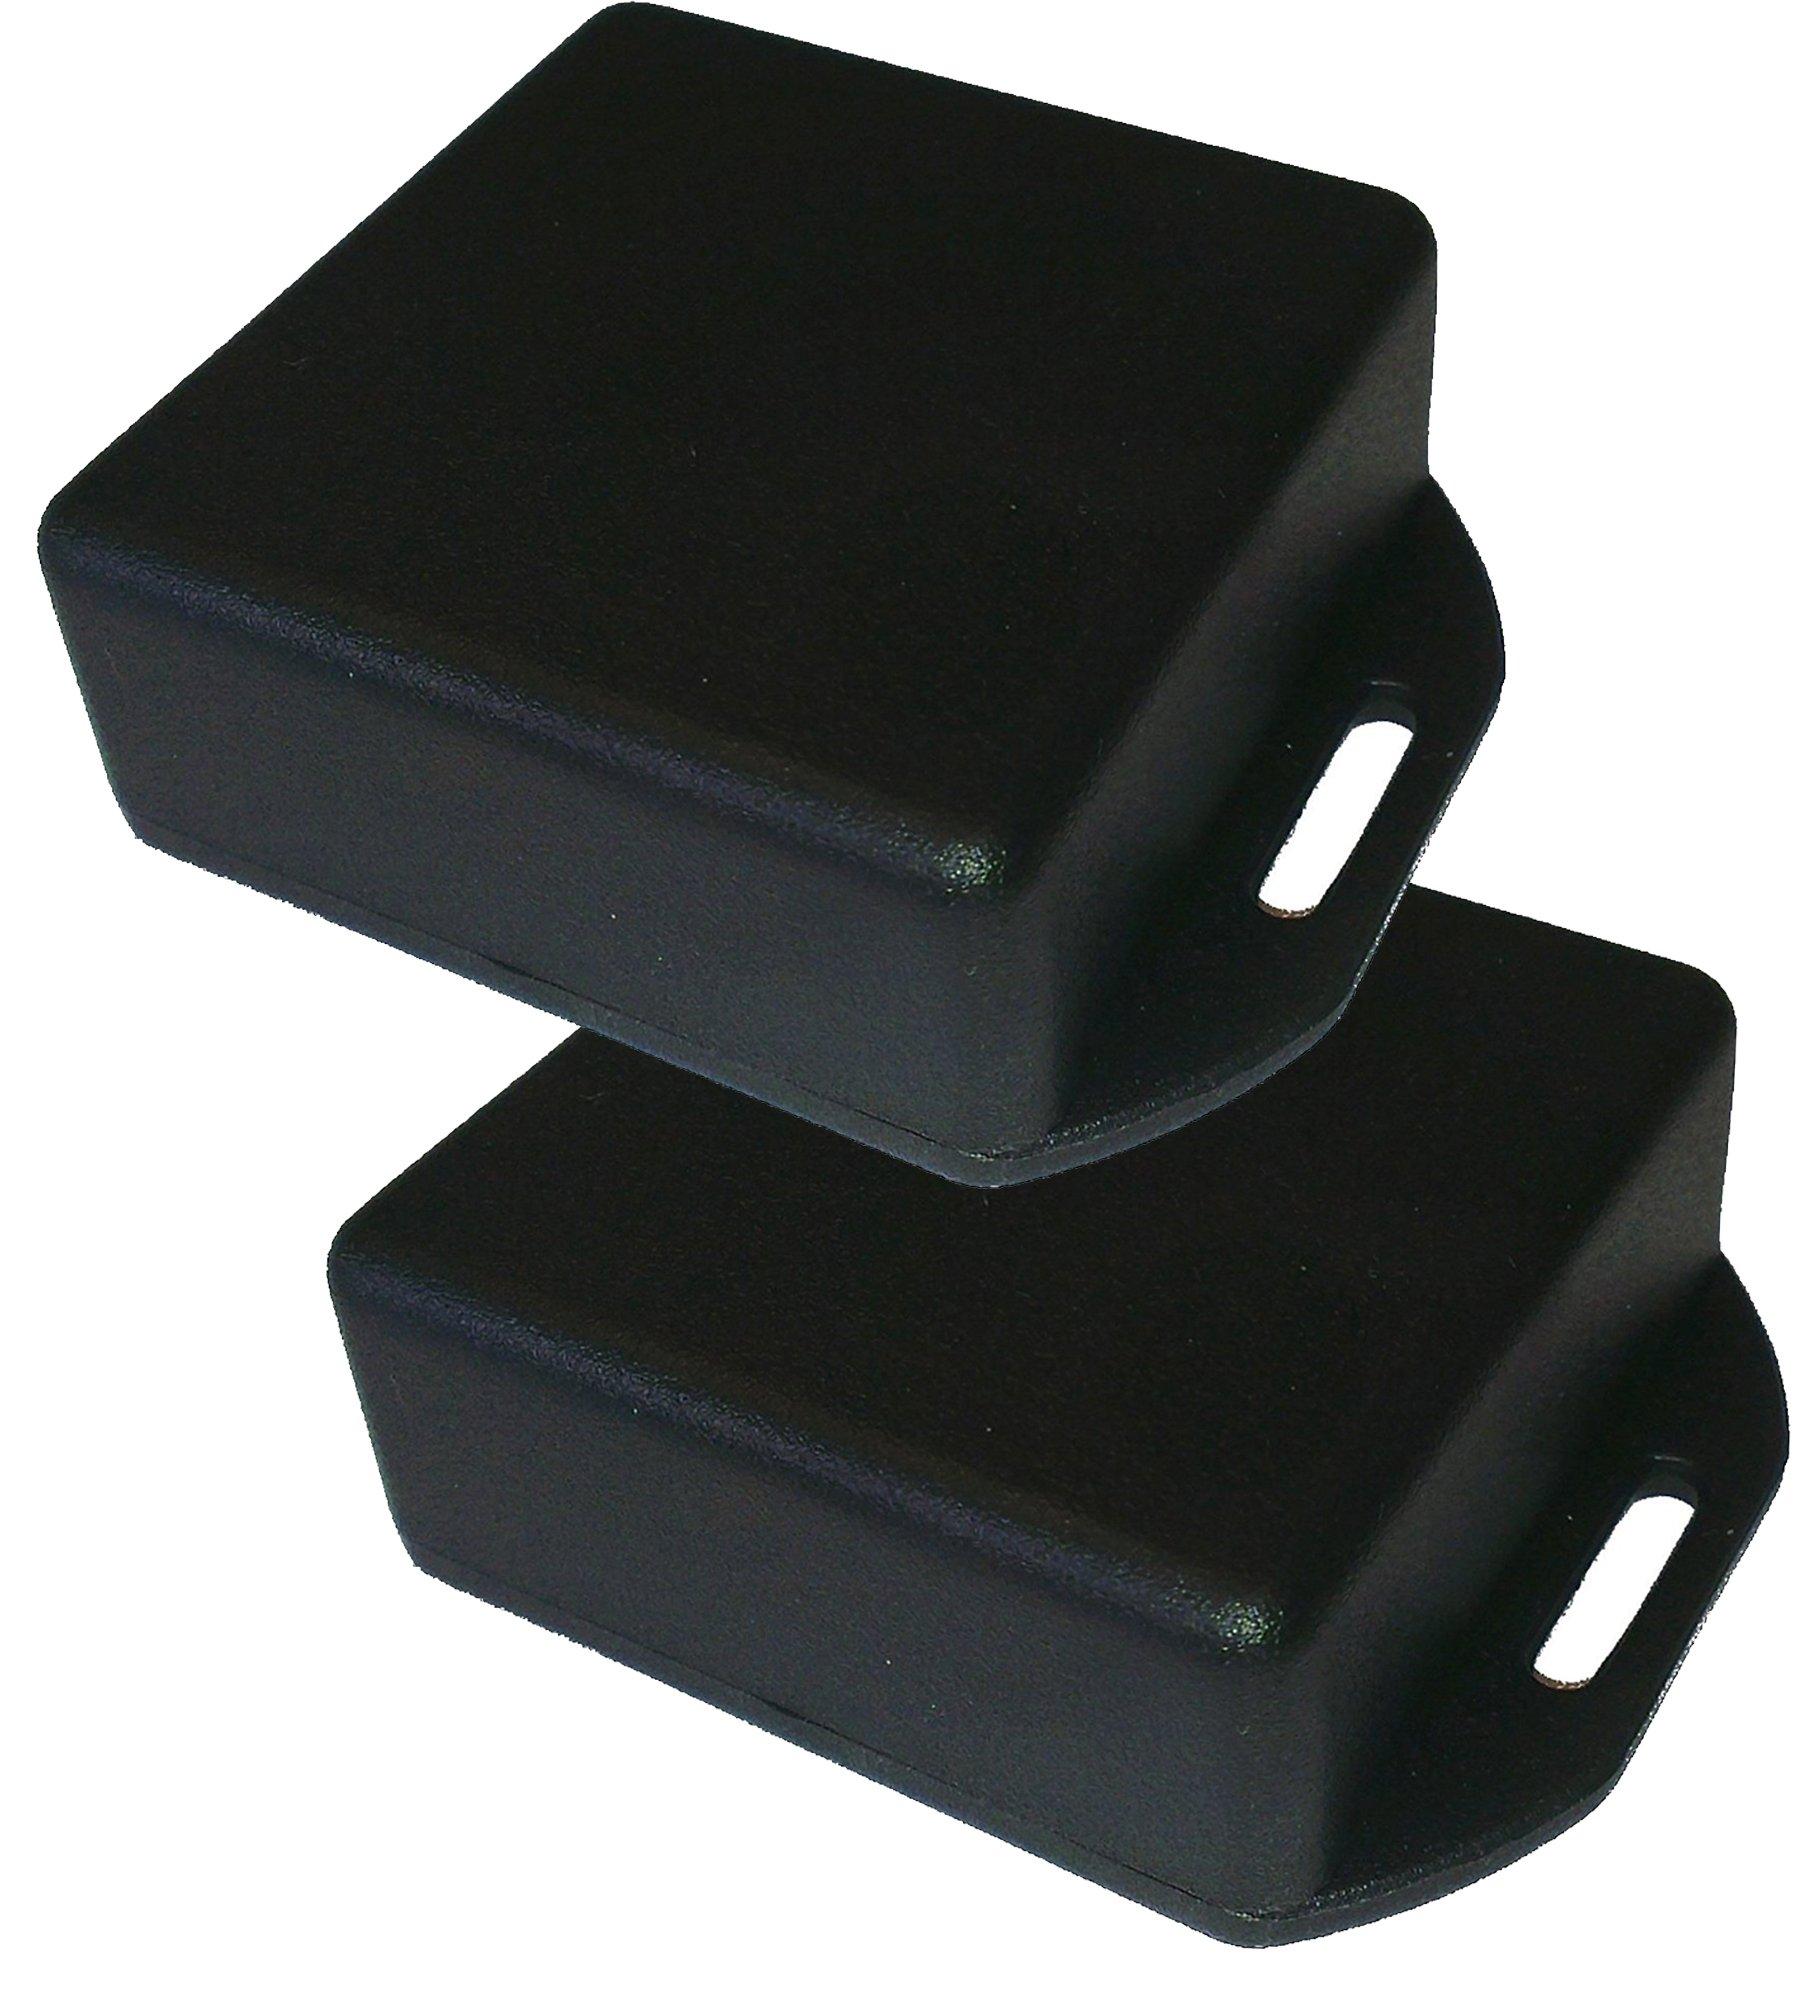 Hammond 1551RFLBK (((PACK OF 2)) Black ABS Plastic Flanged Lid Project Box, 50mm x 50mm